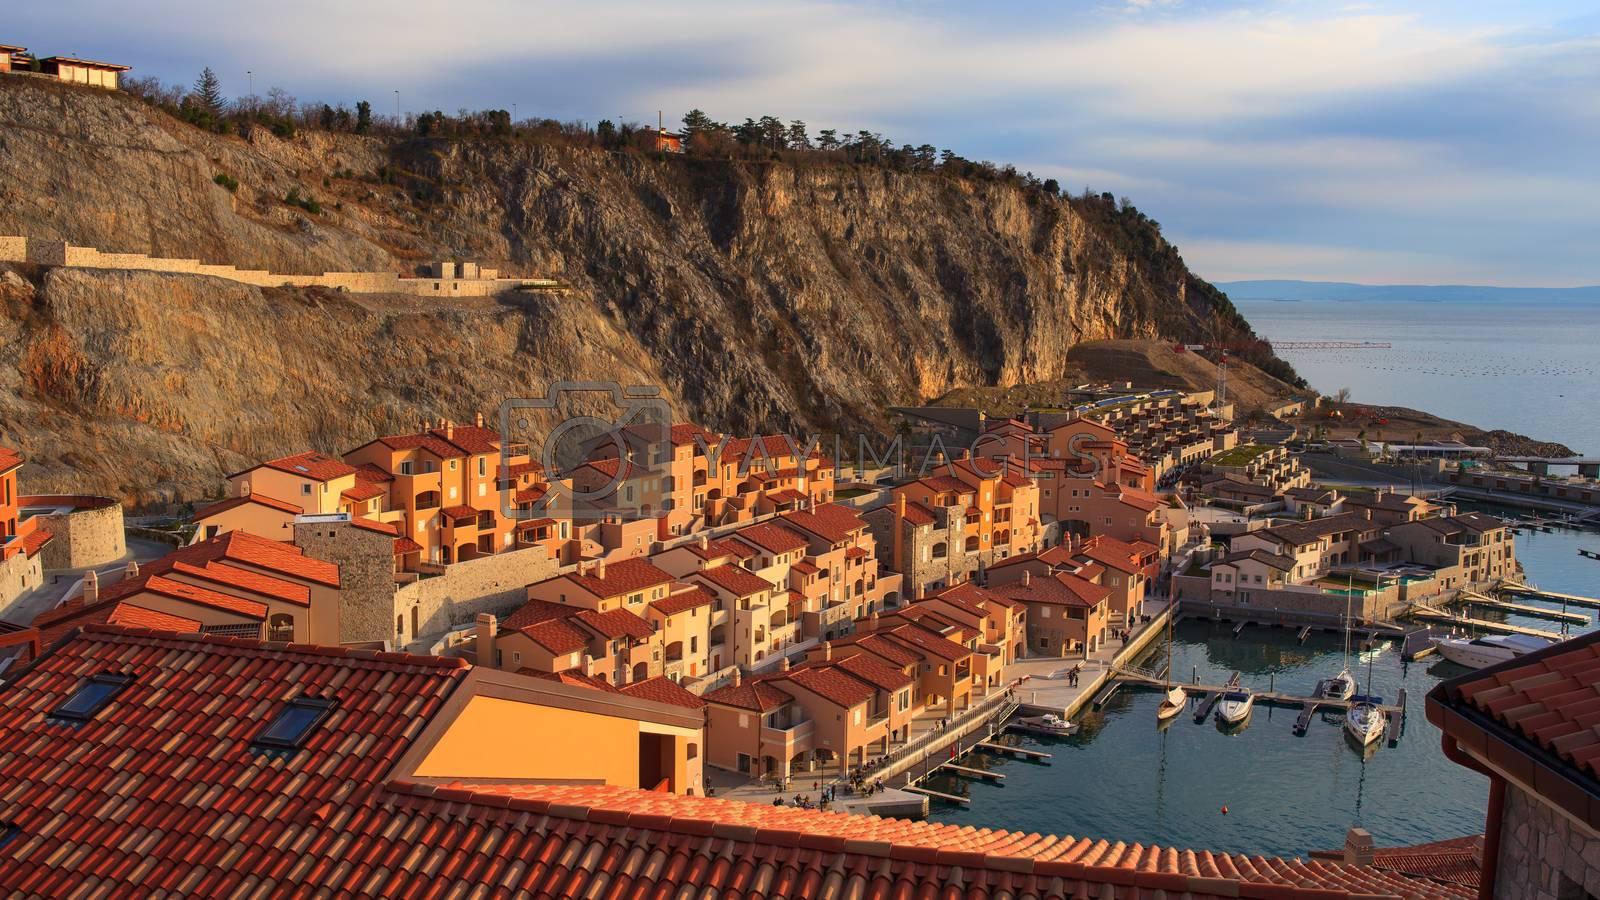 View of vacation house in Porto piccolo, Sistiana. Italy